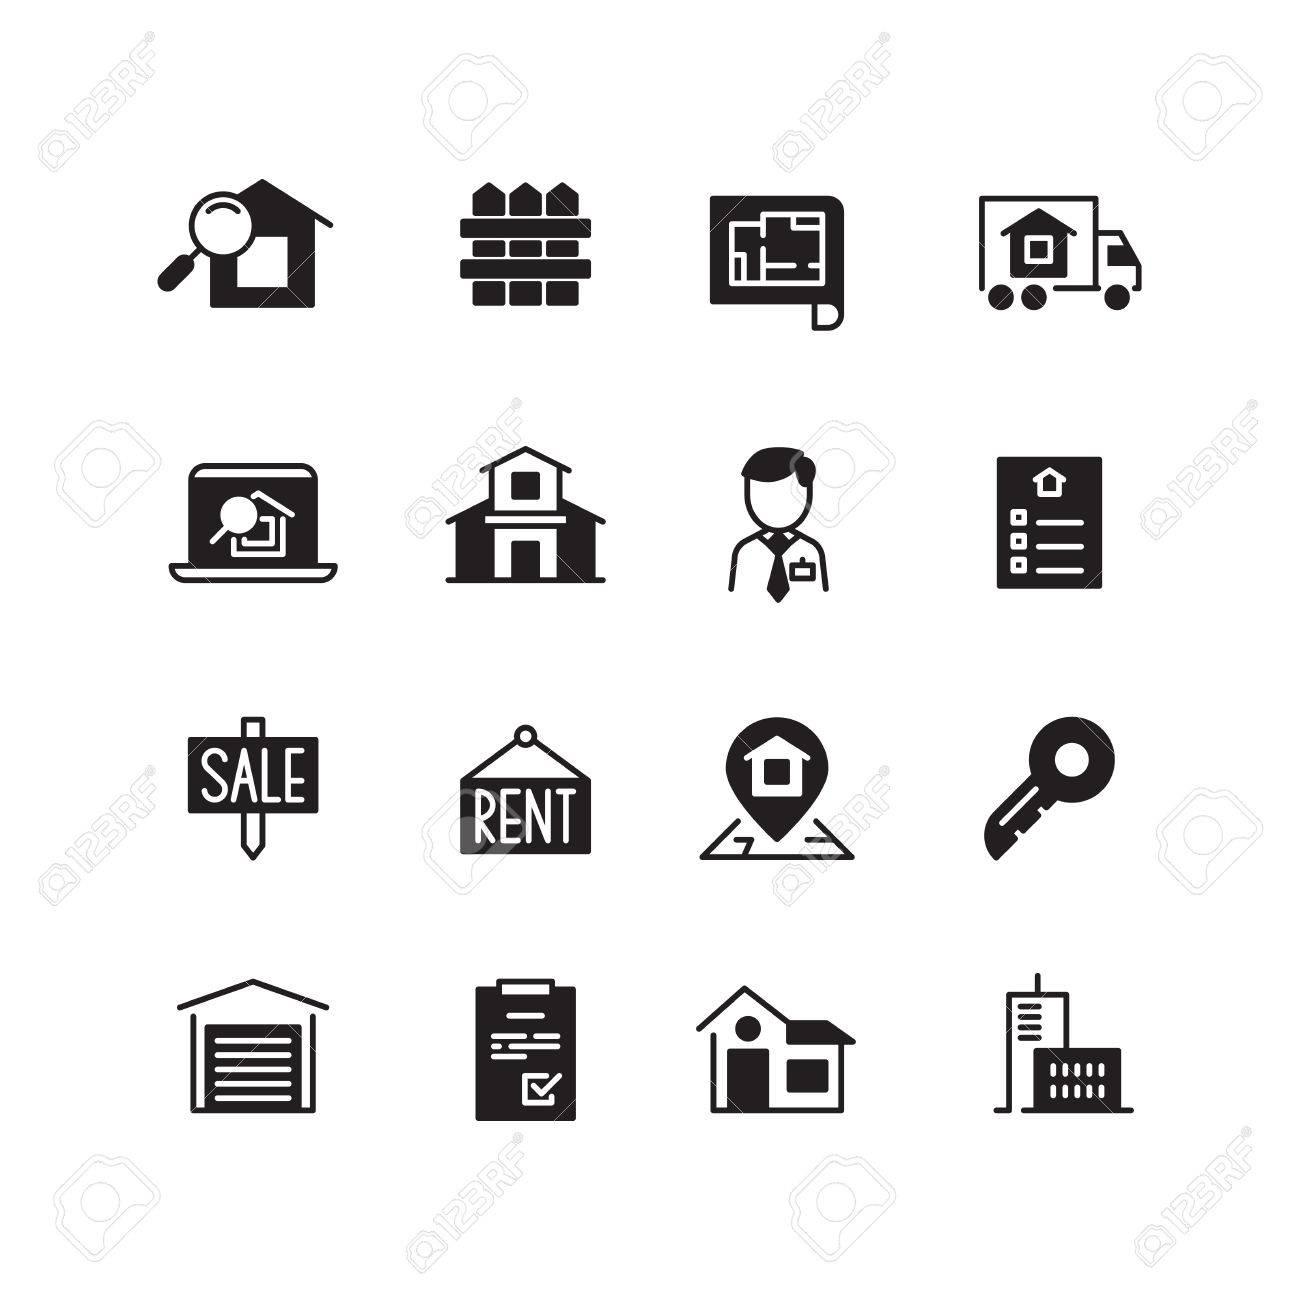 Immobilien Haus Vektor Icons Immobilien Verkaufen Haus Gebäude